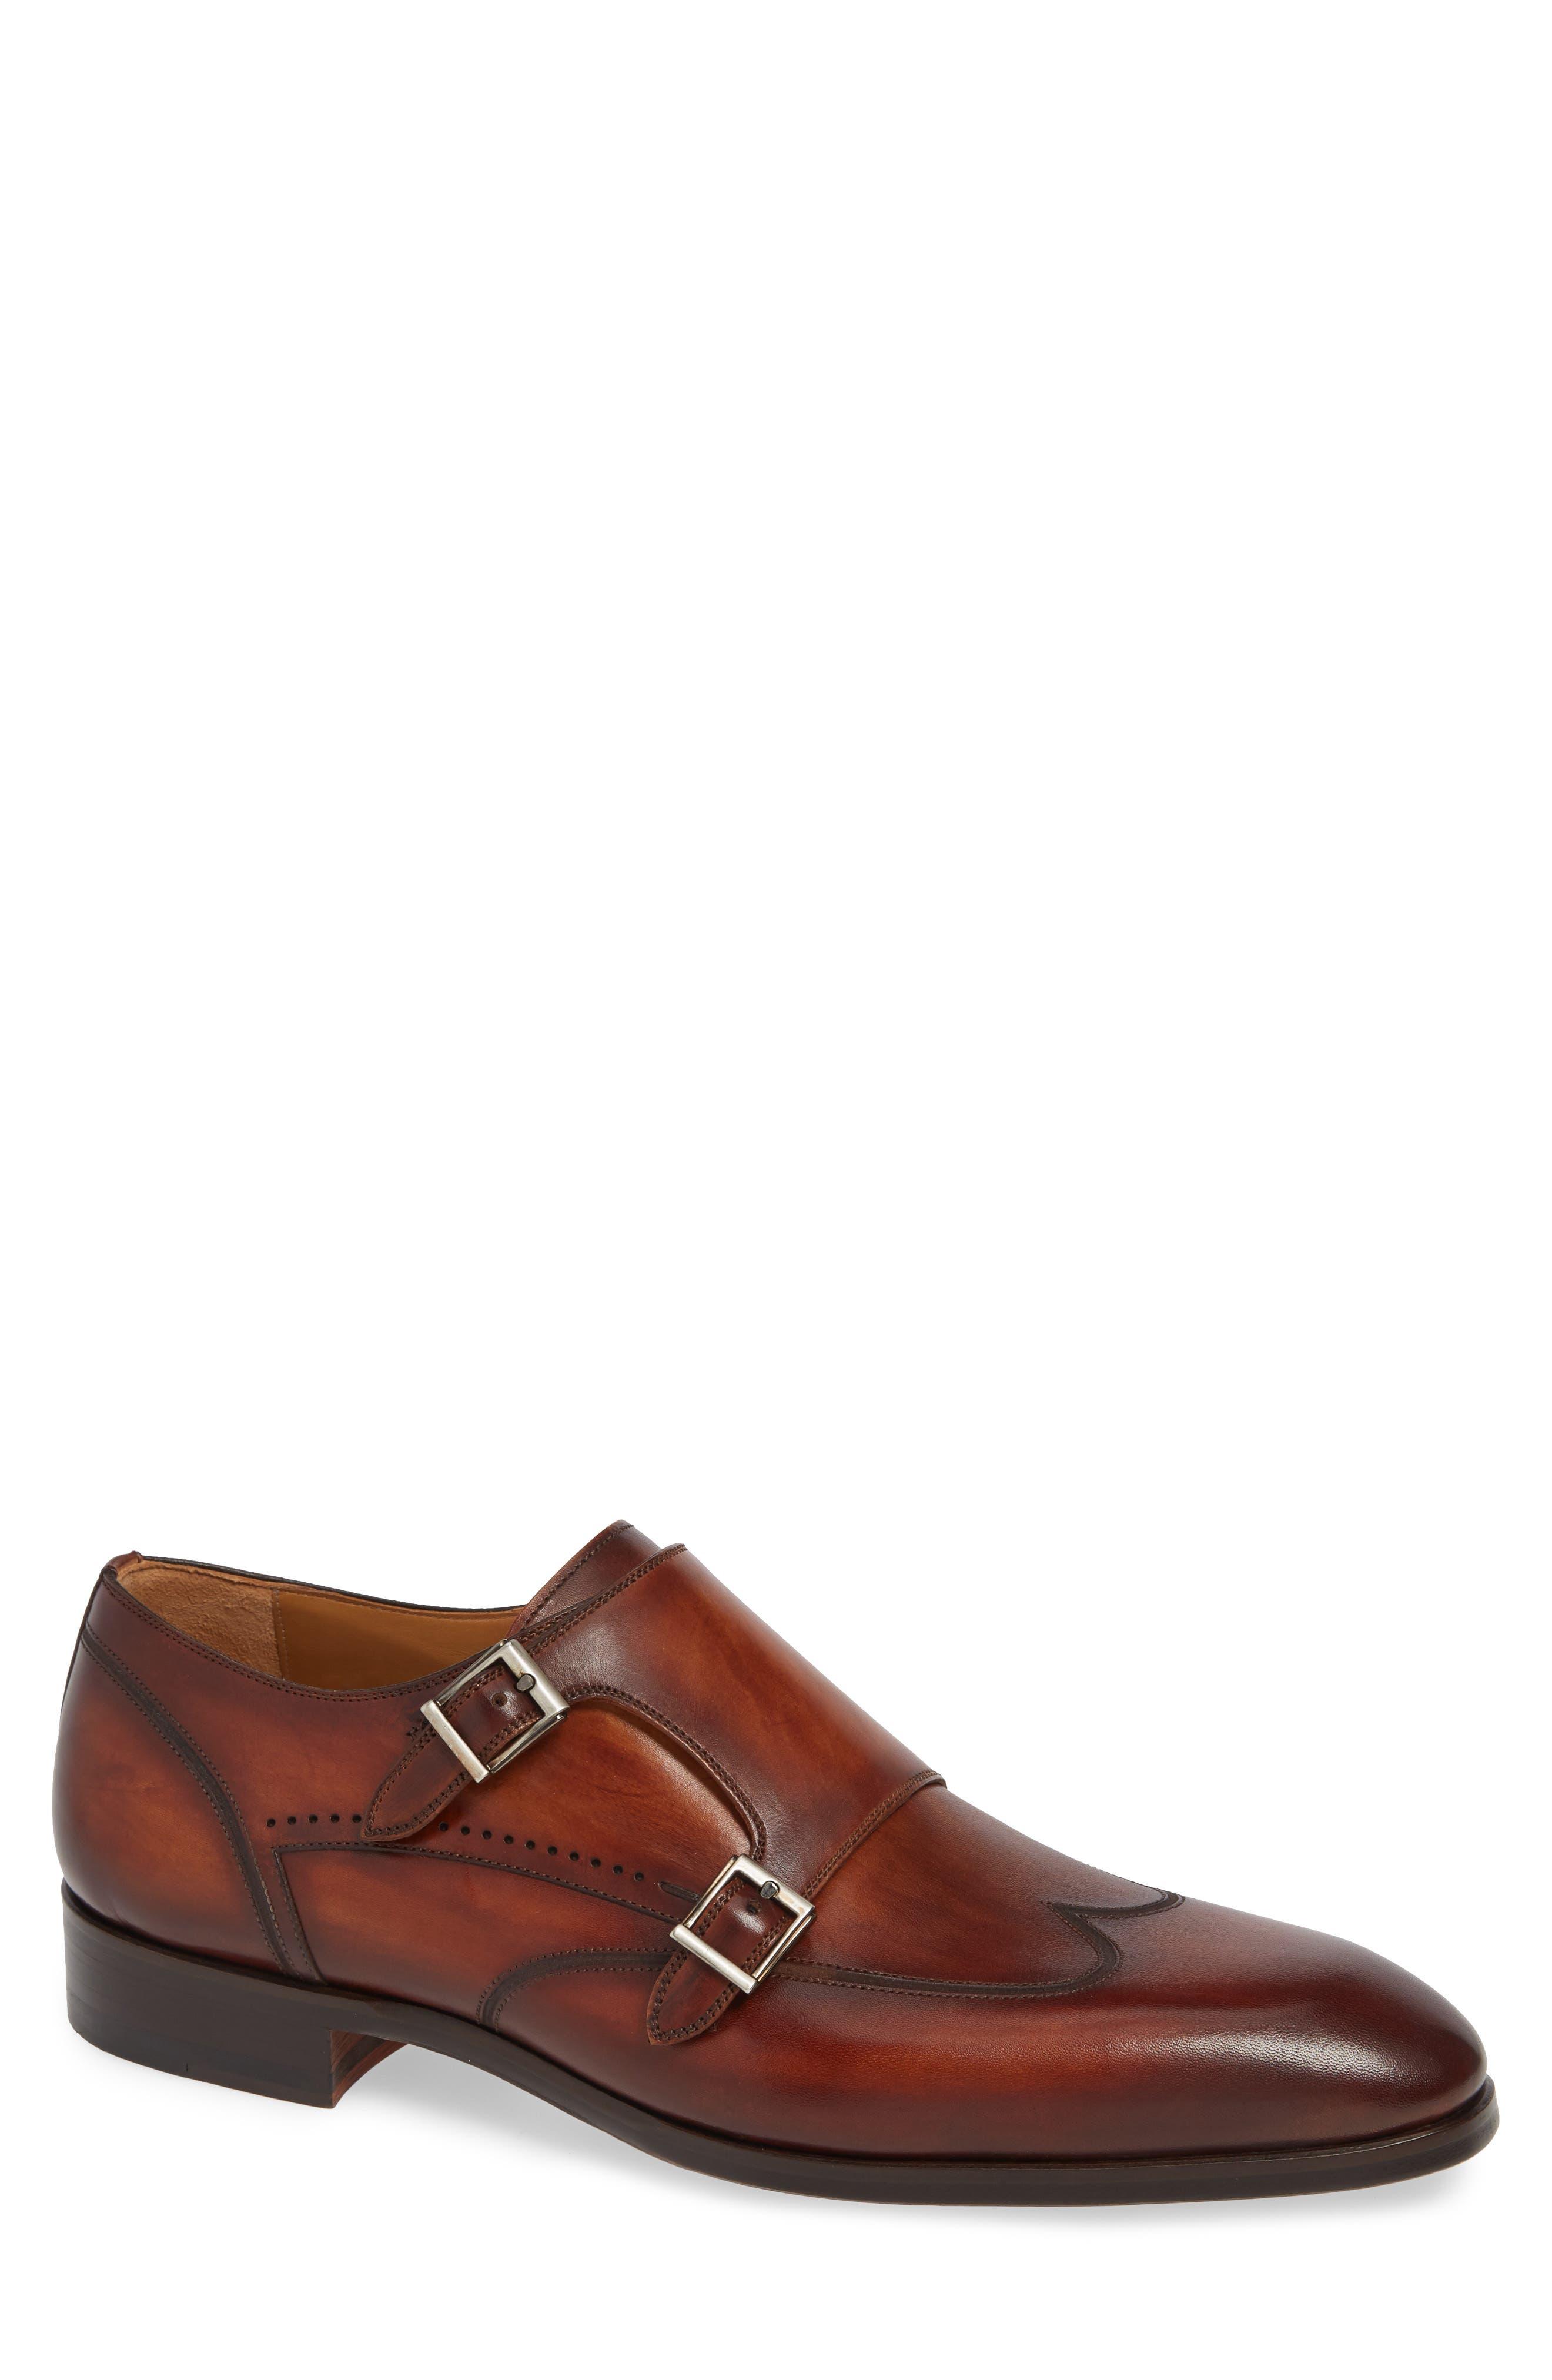 Camden Double Monk Strap Shoe,                         Main,                         color, 202